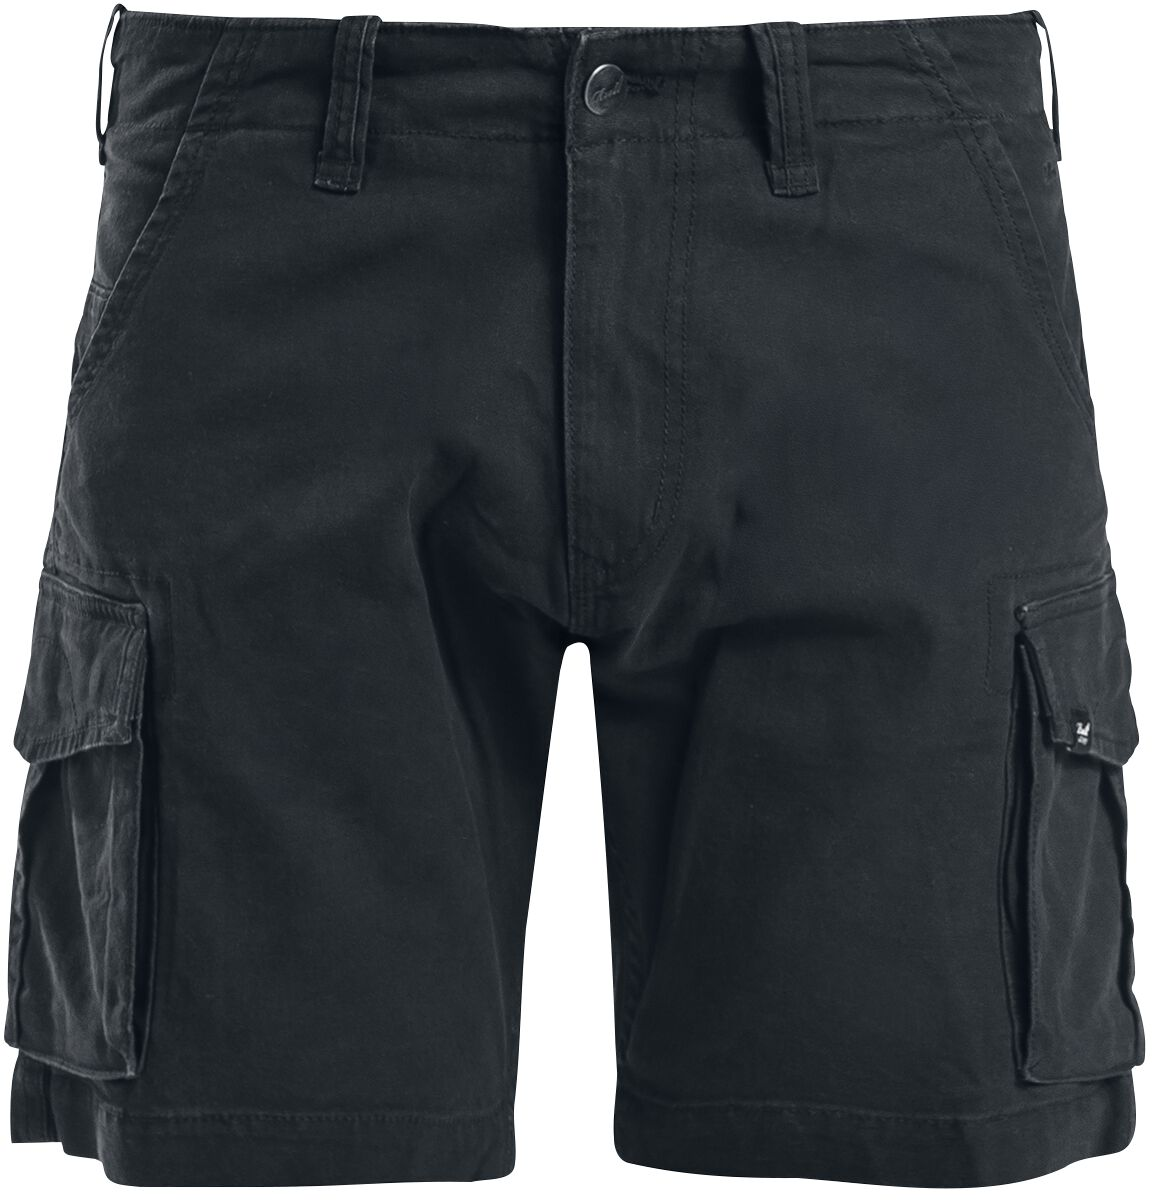 Image of Reell City Cargo Short ST Cargo-Shorts schwarz